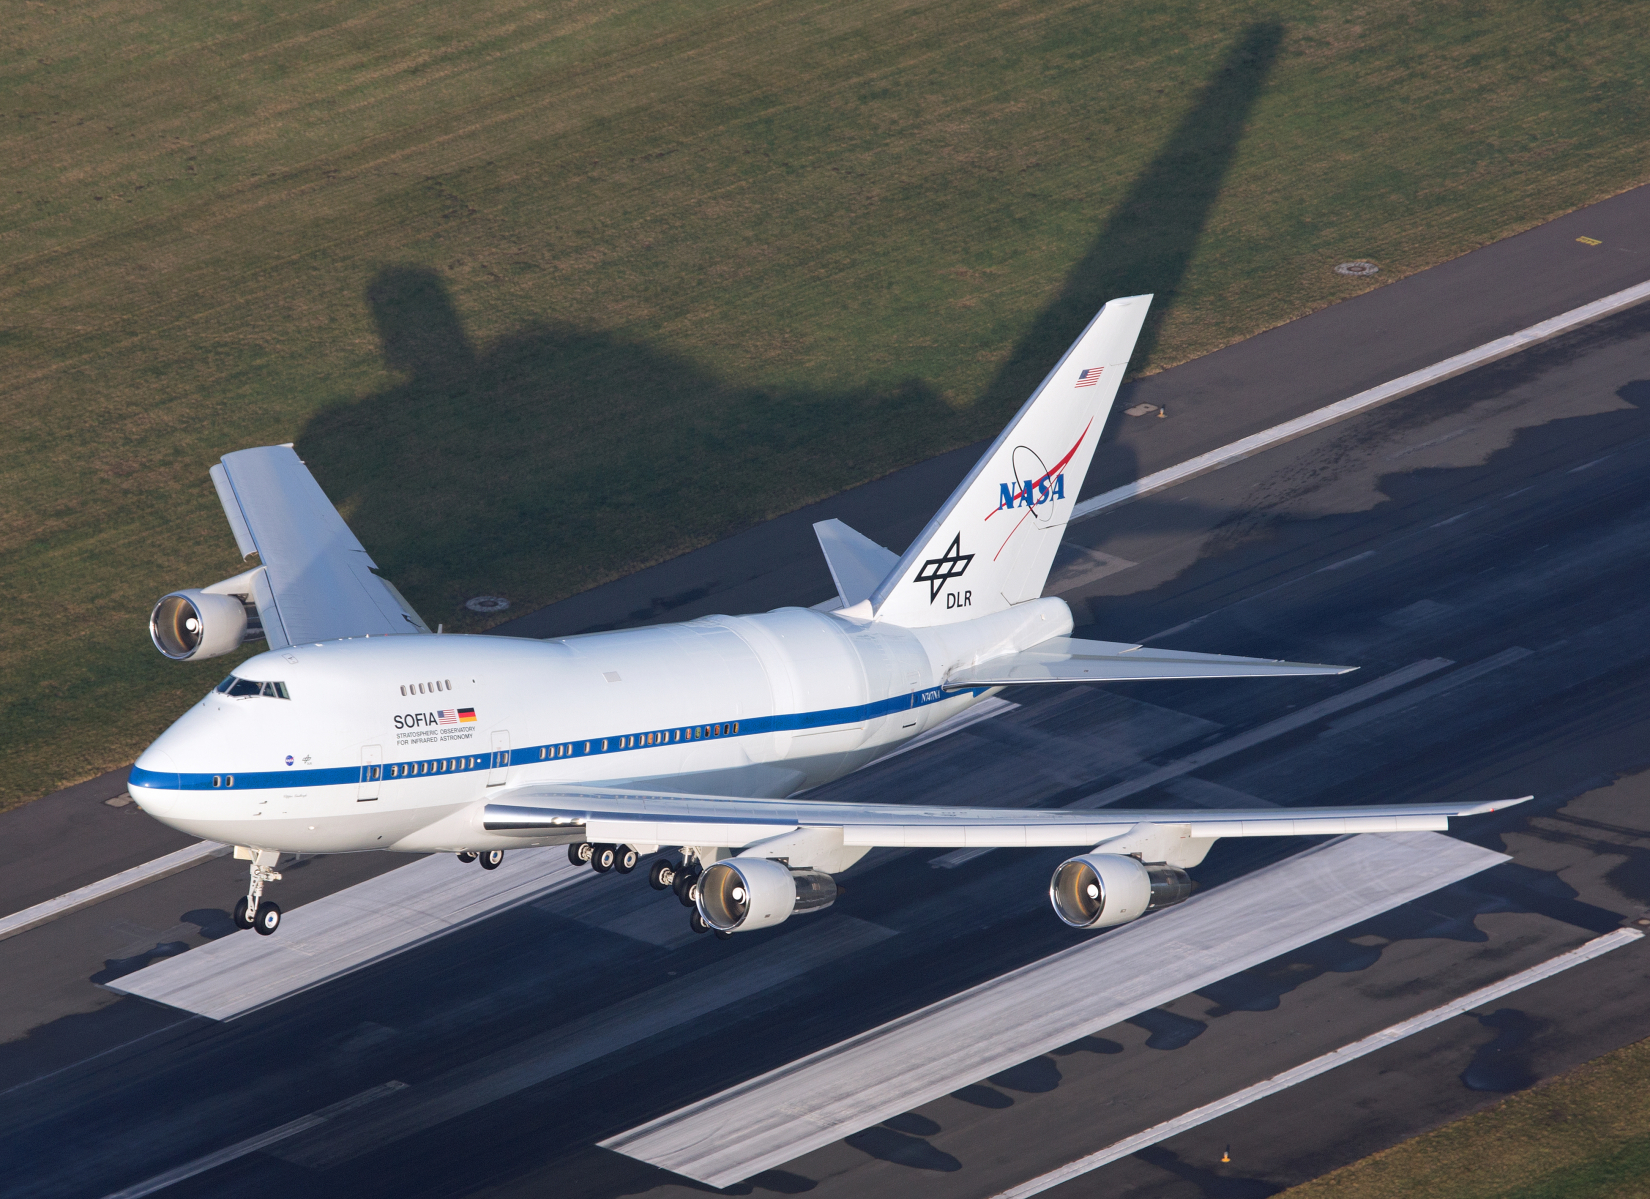 SOFIA takes off from Hamburg